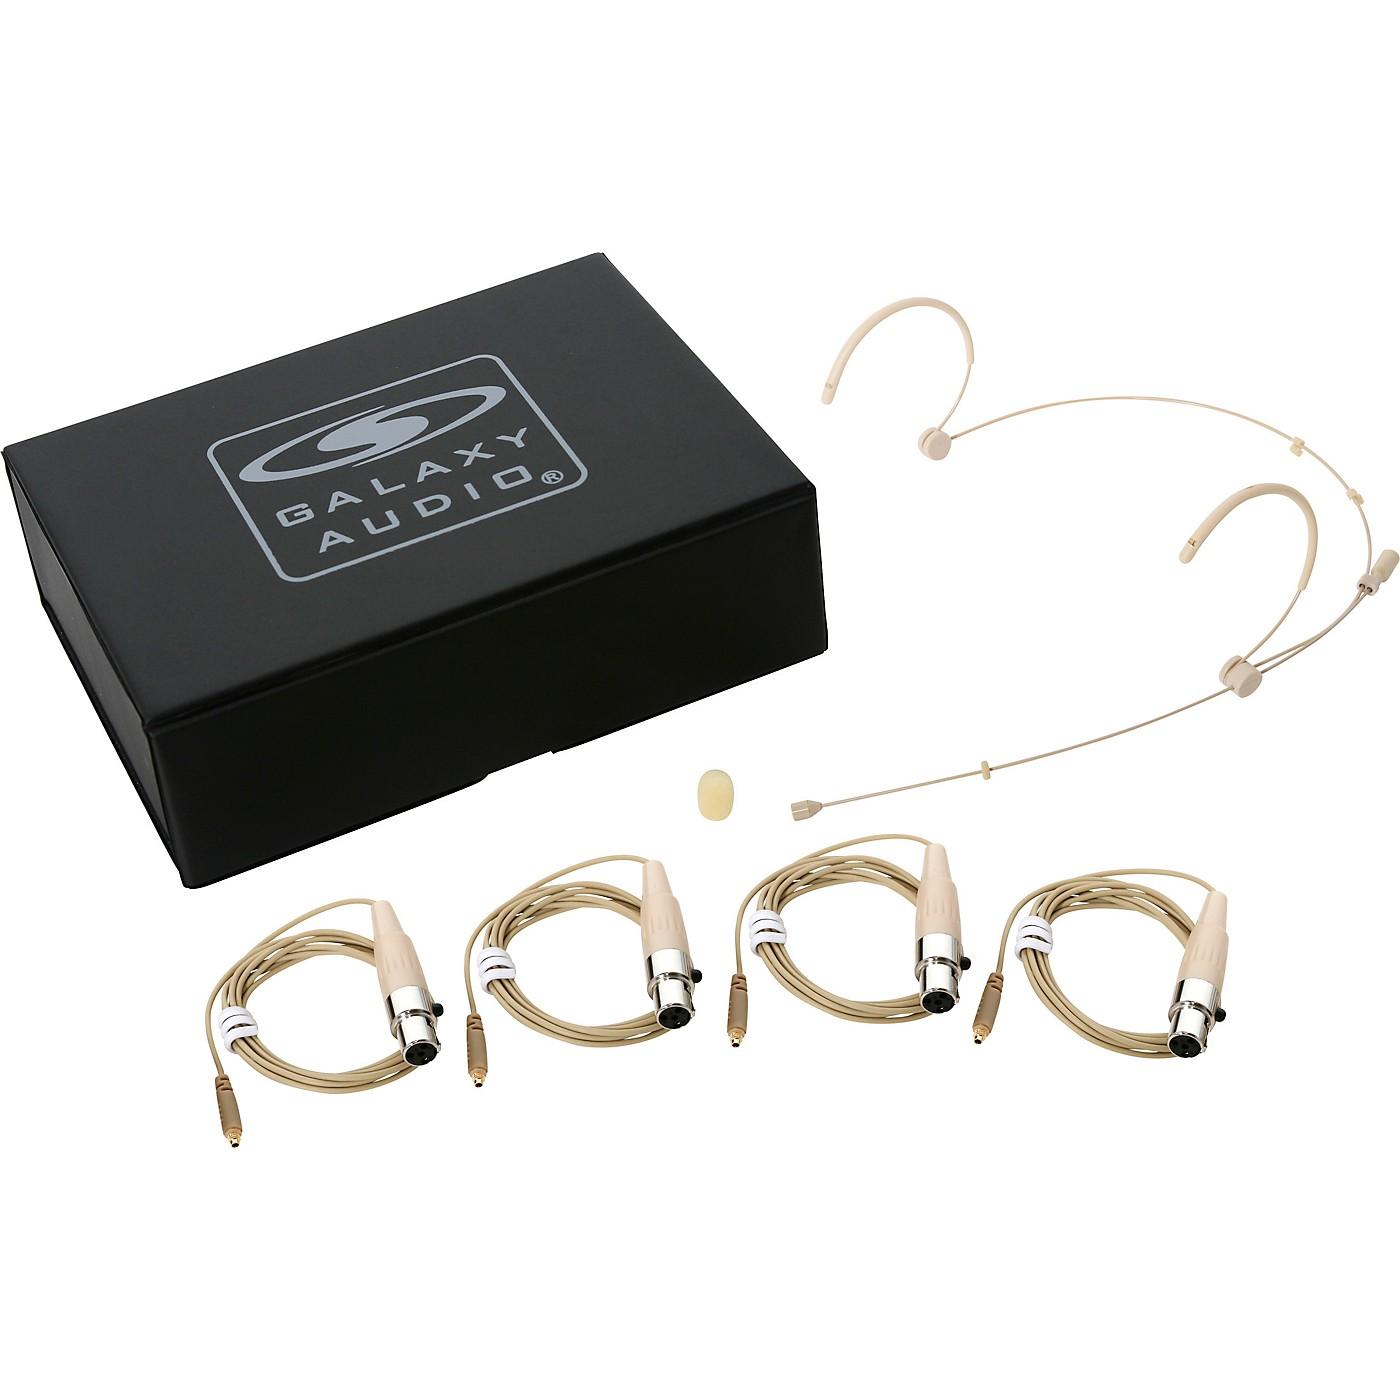 Galaxy Audio HSM3 Dual Ear Headset Microphone for Galaxy Audio/AKG Systems thumbnail